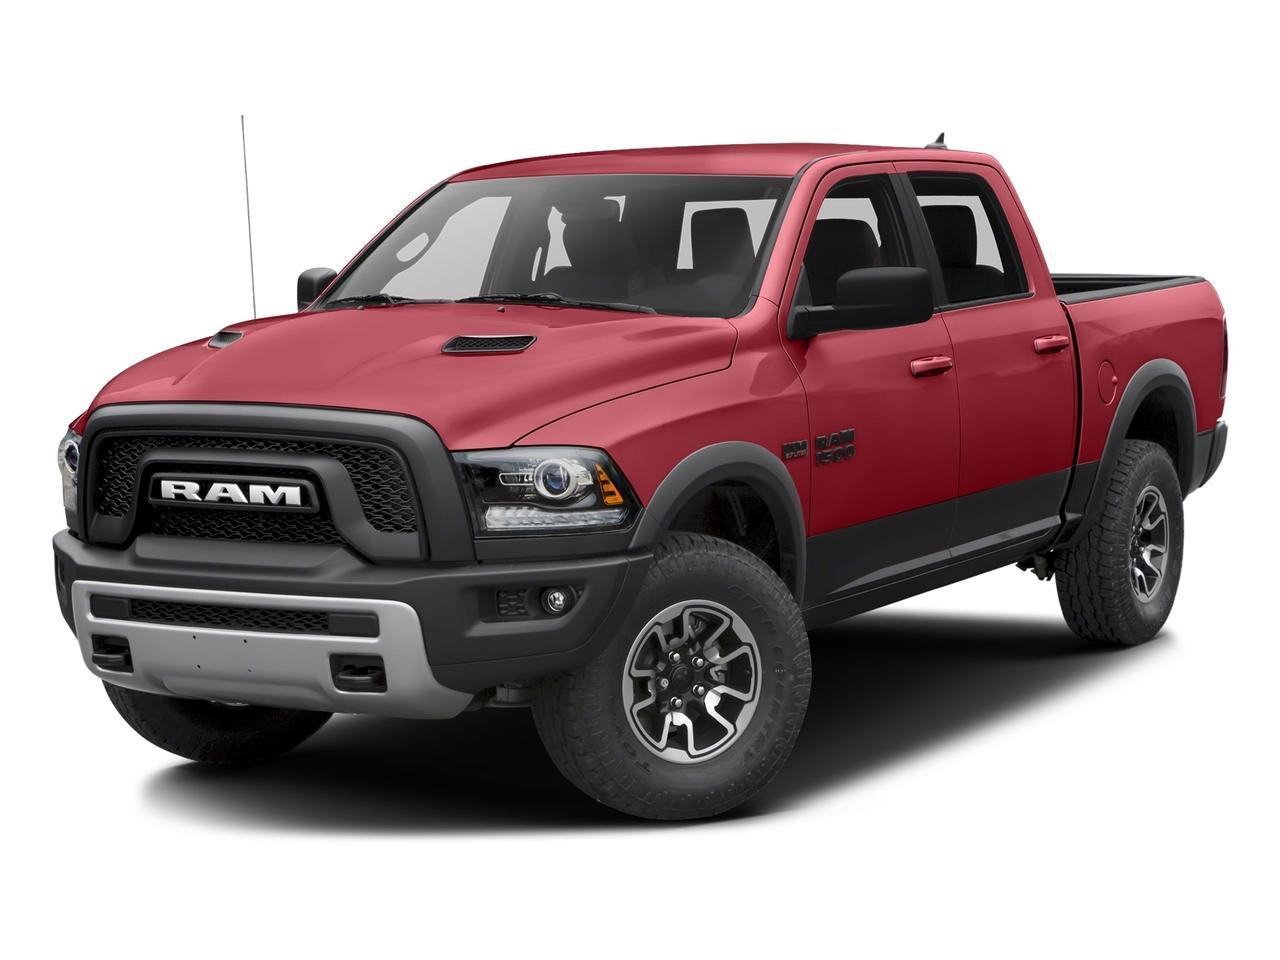 2016 Ram 1500 Vehicle Photo in Anchorage, AK 99515